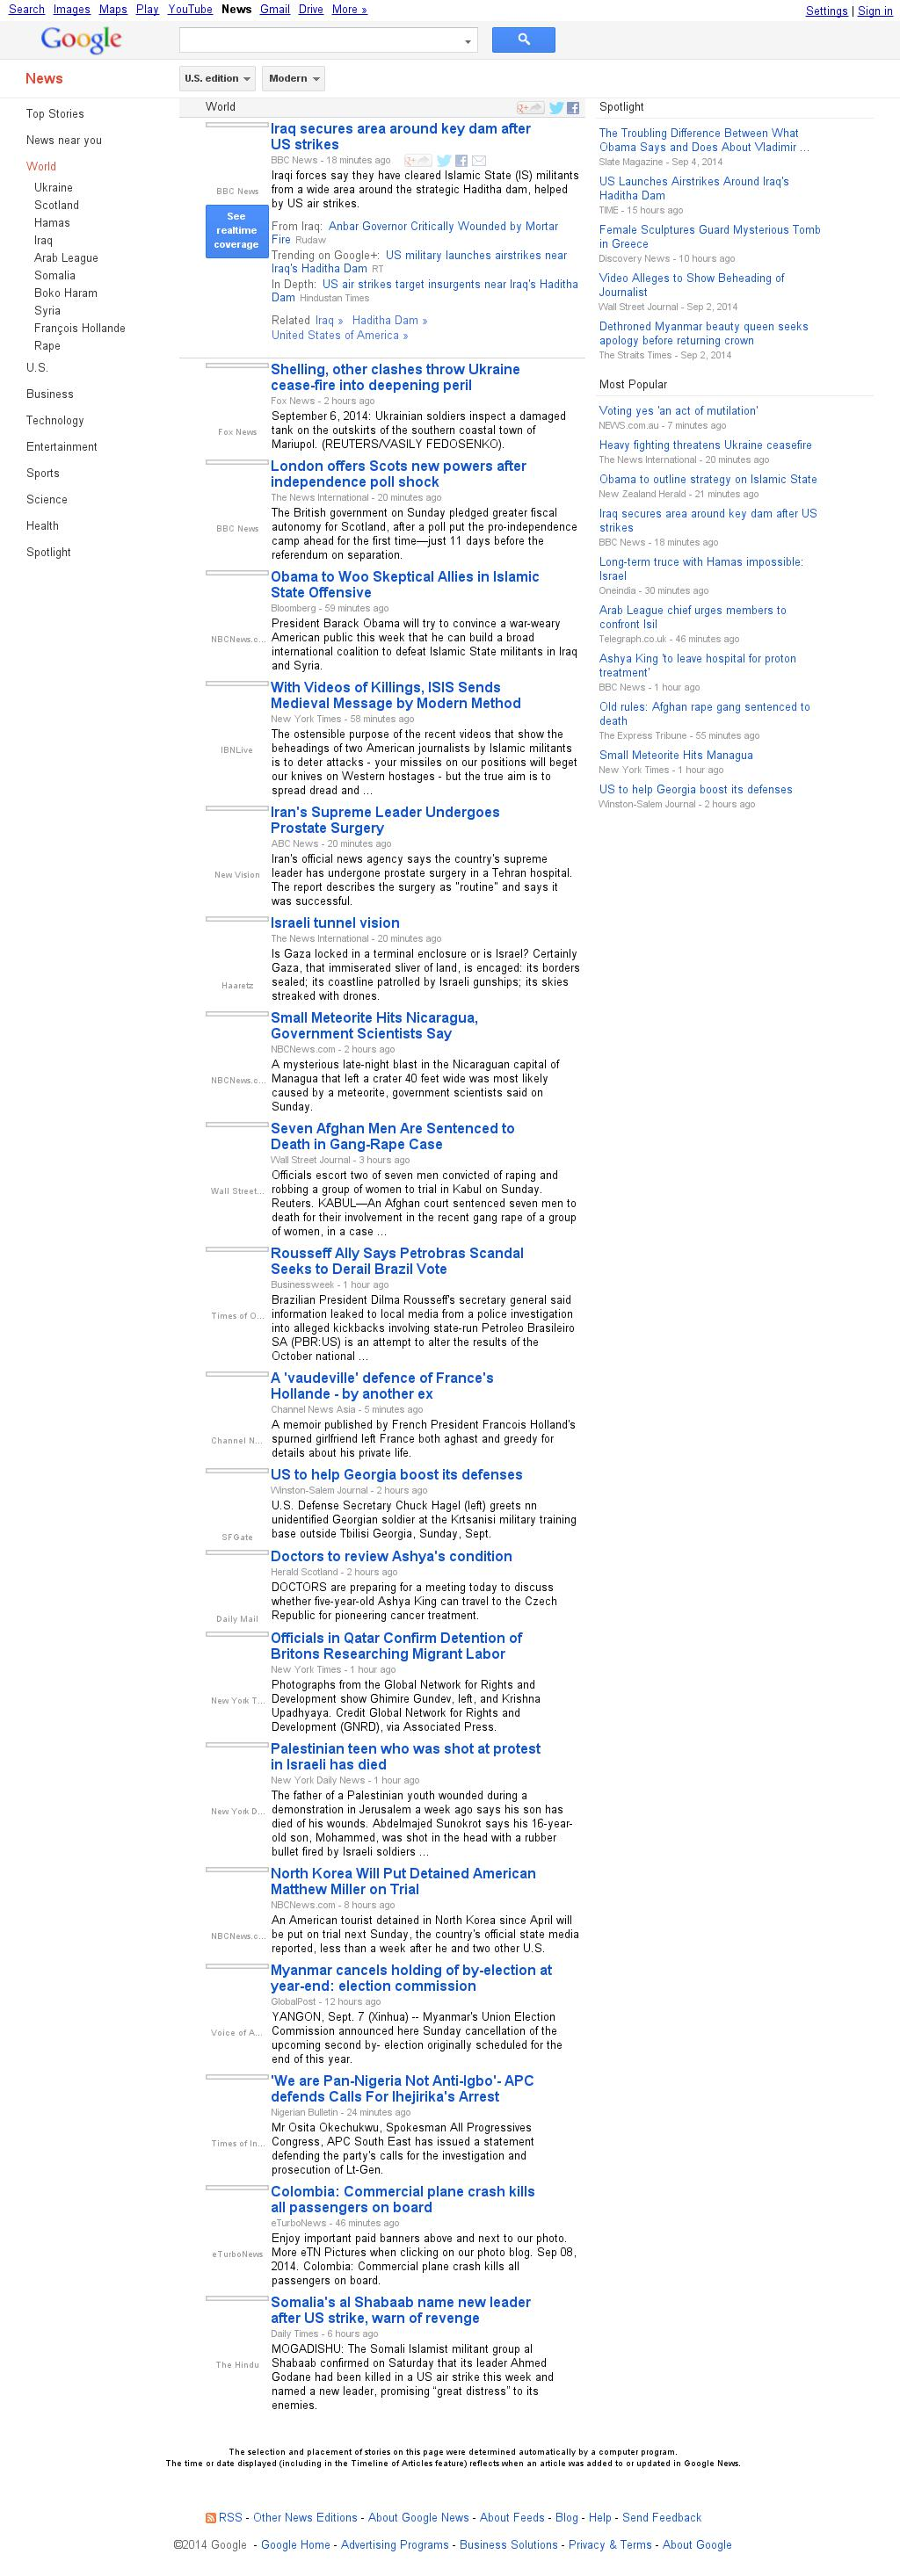 Google News: World at Monday Sept. 8, 2014, 5:07 a.m. UTC